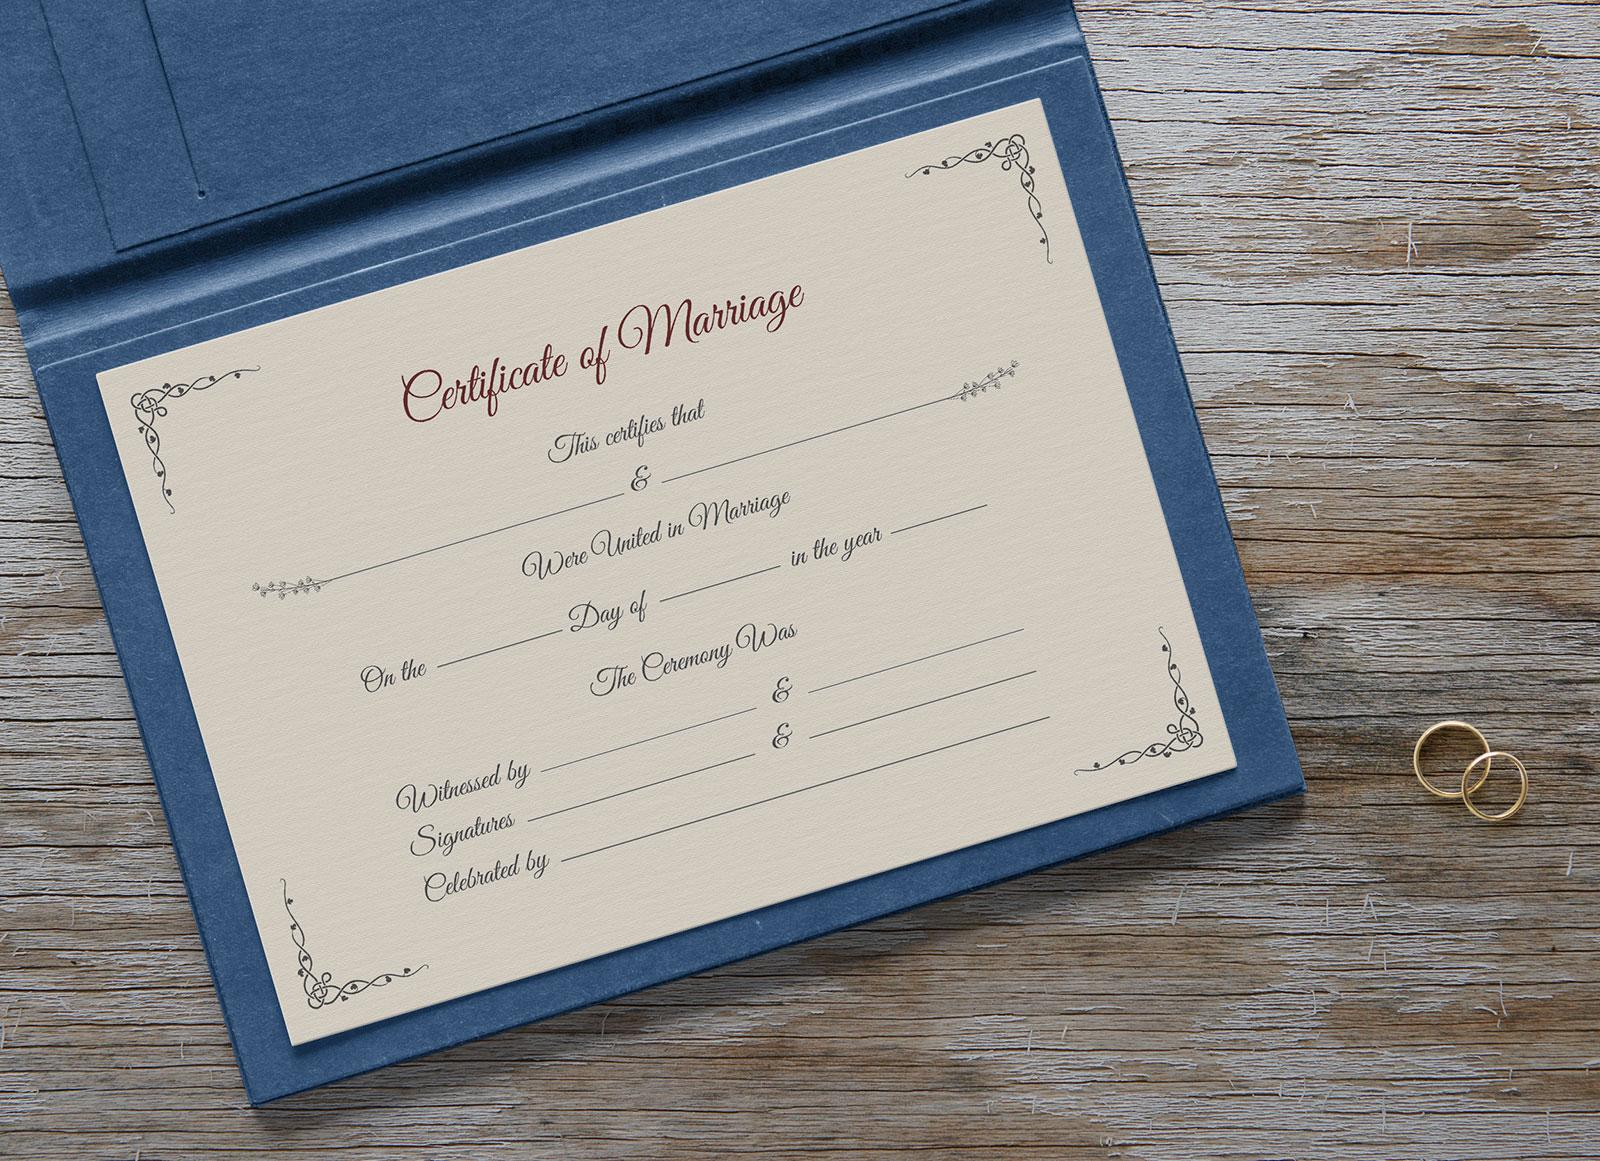 Free-Wedding-Certificate-Mockup-PSD